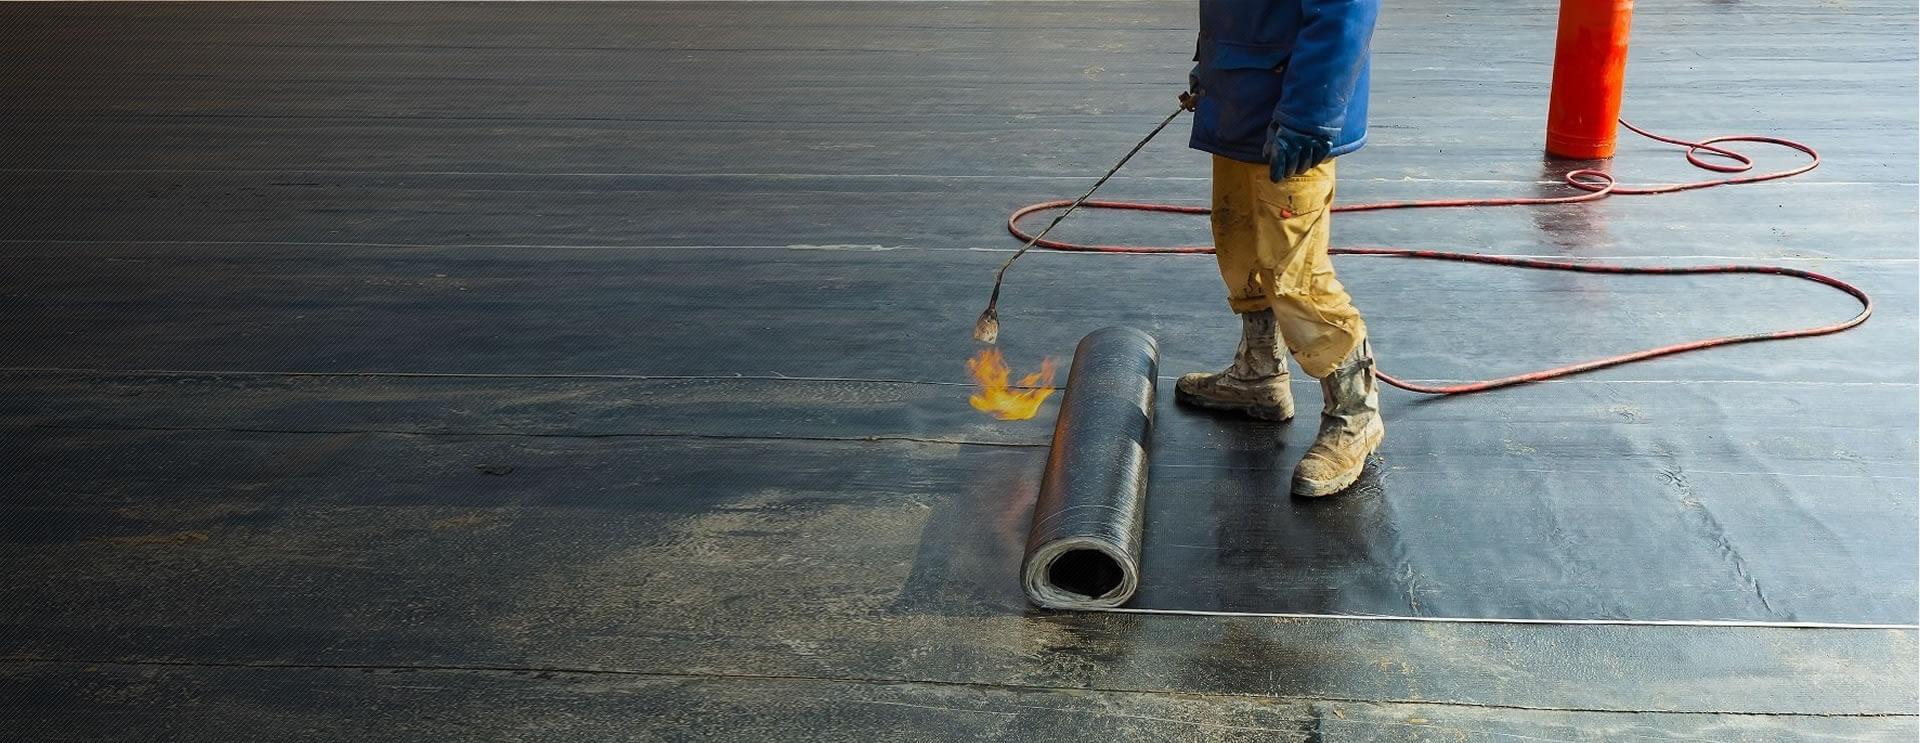 Australian Waterproofing Company (@waterproofingau) Cover Image